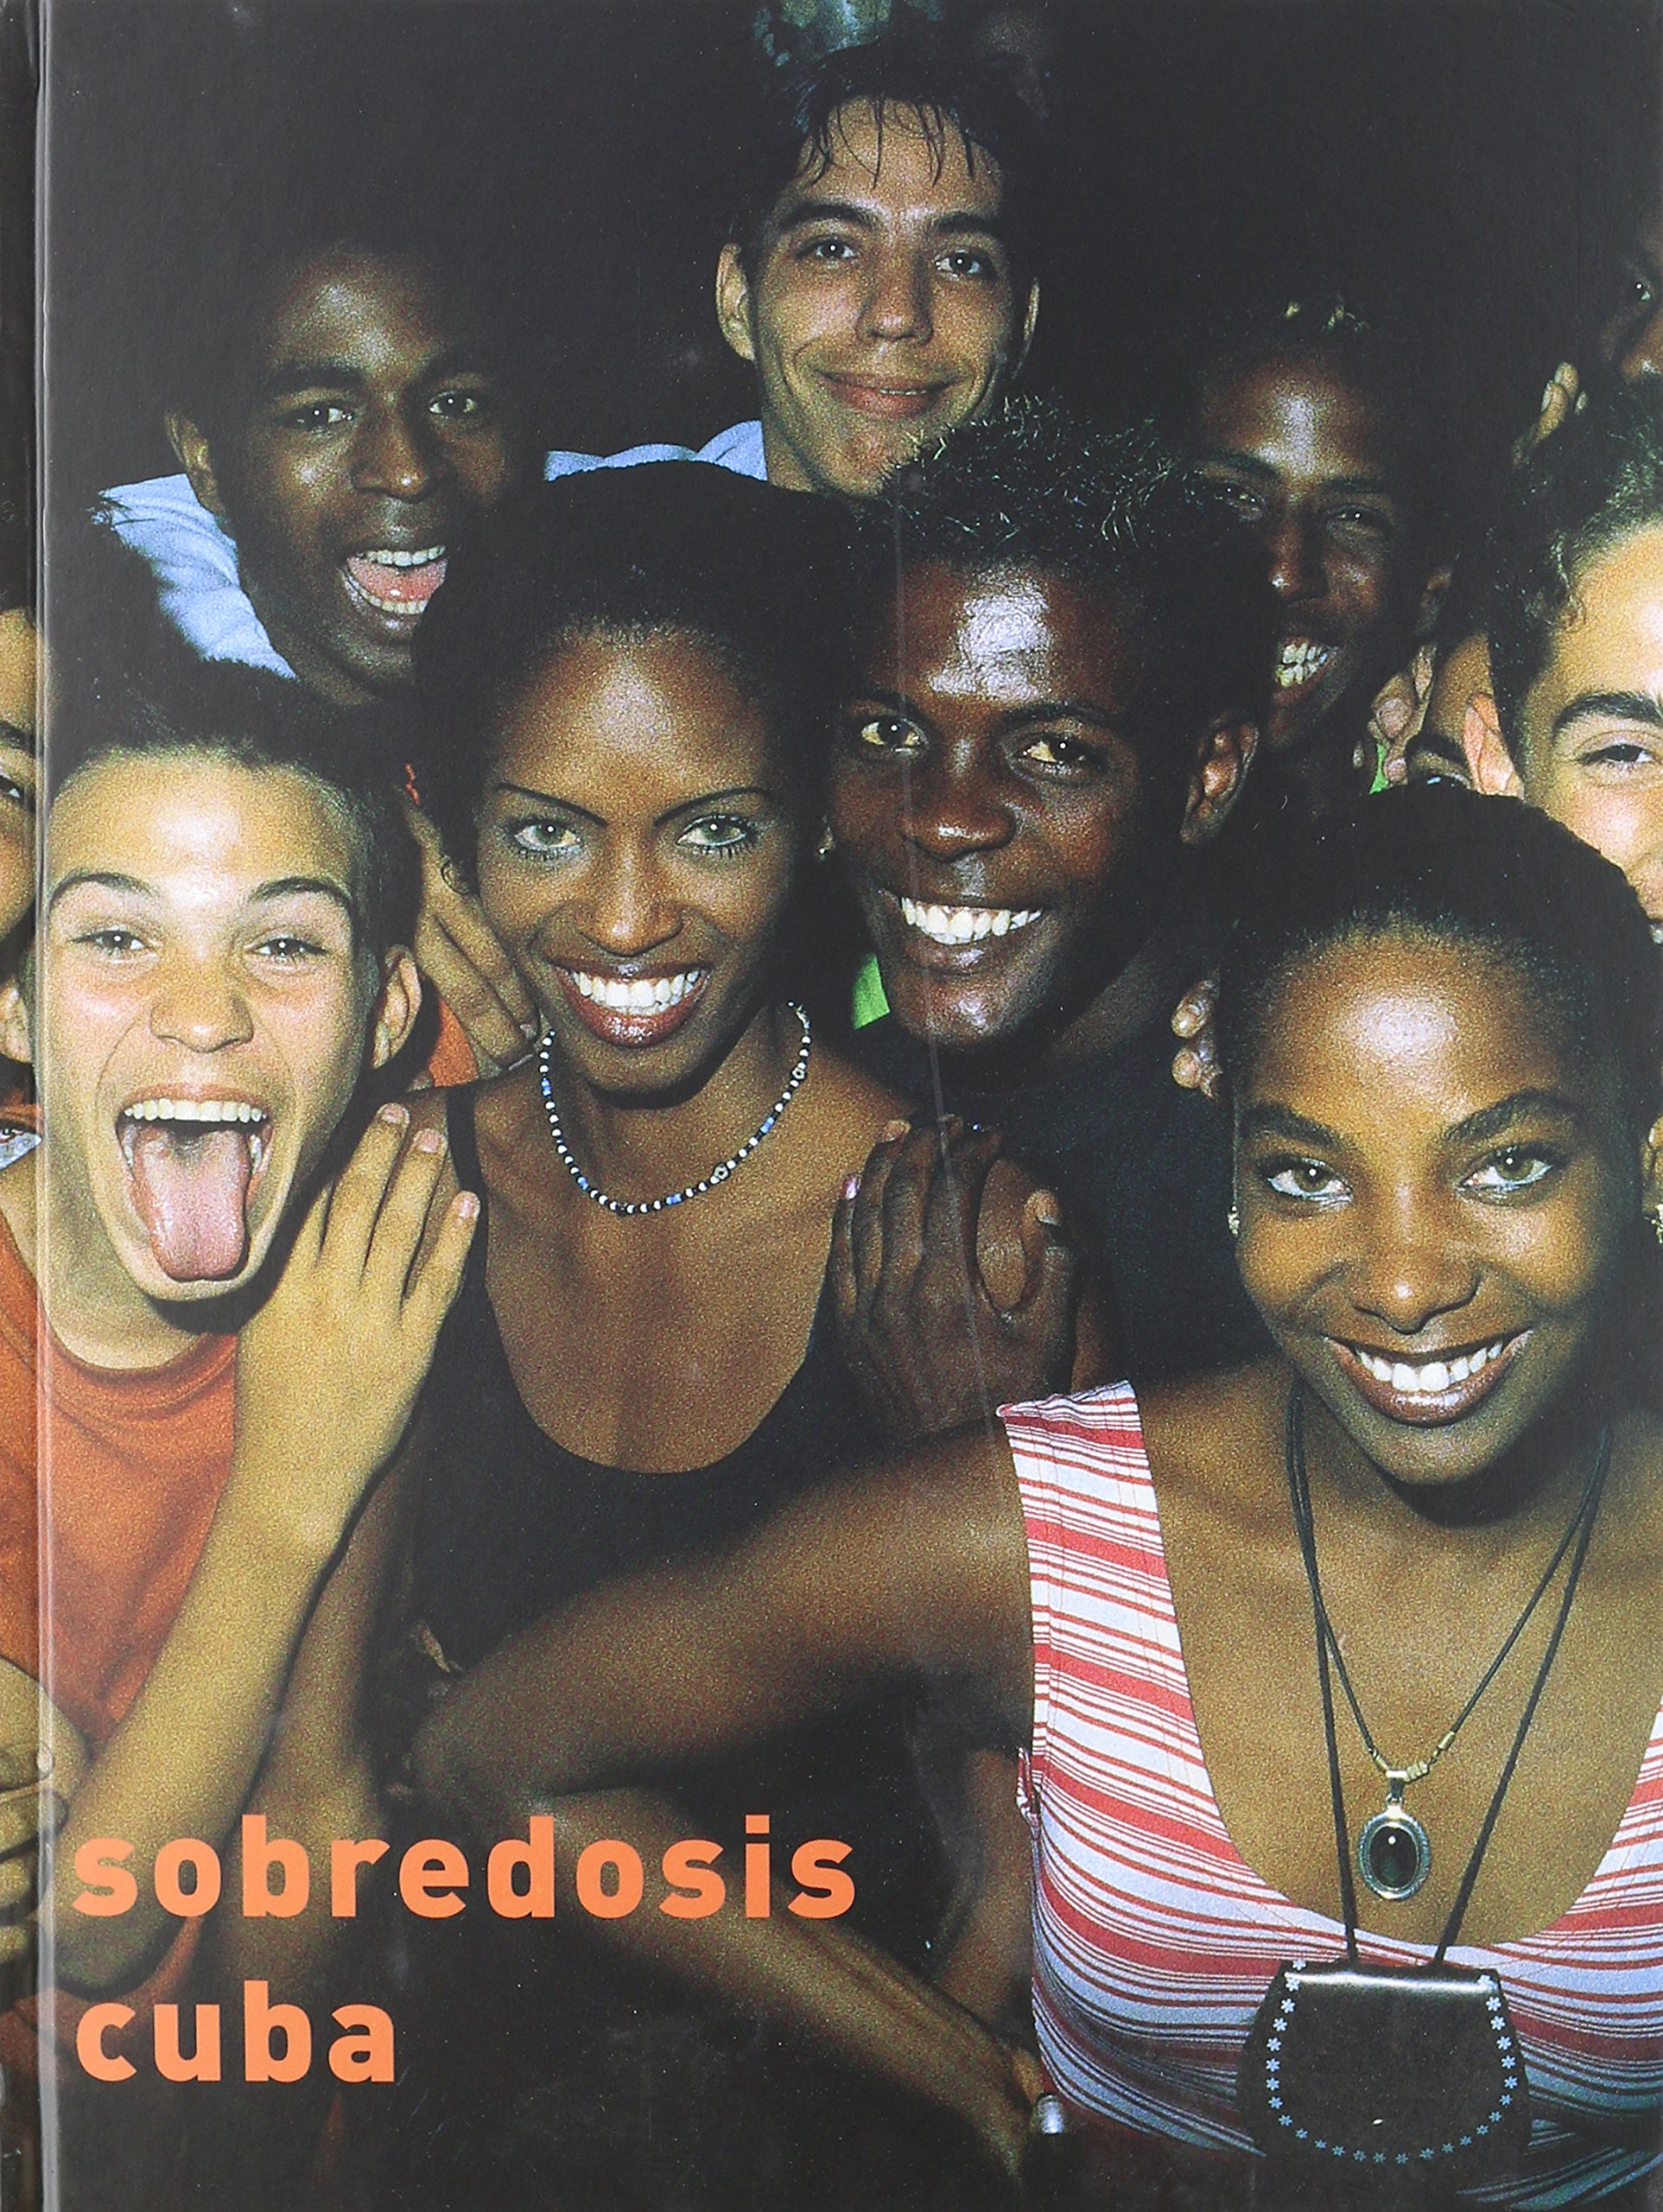 Sobredosis Cuba (Spanish Edition)